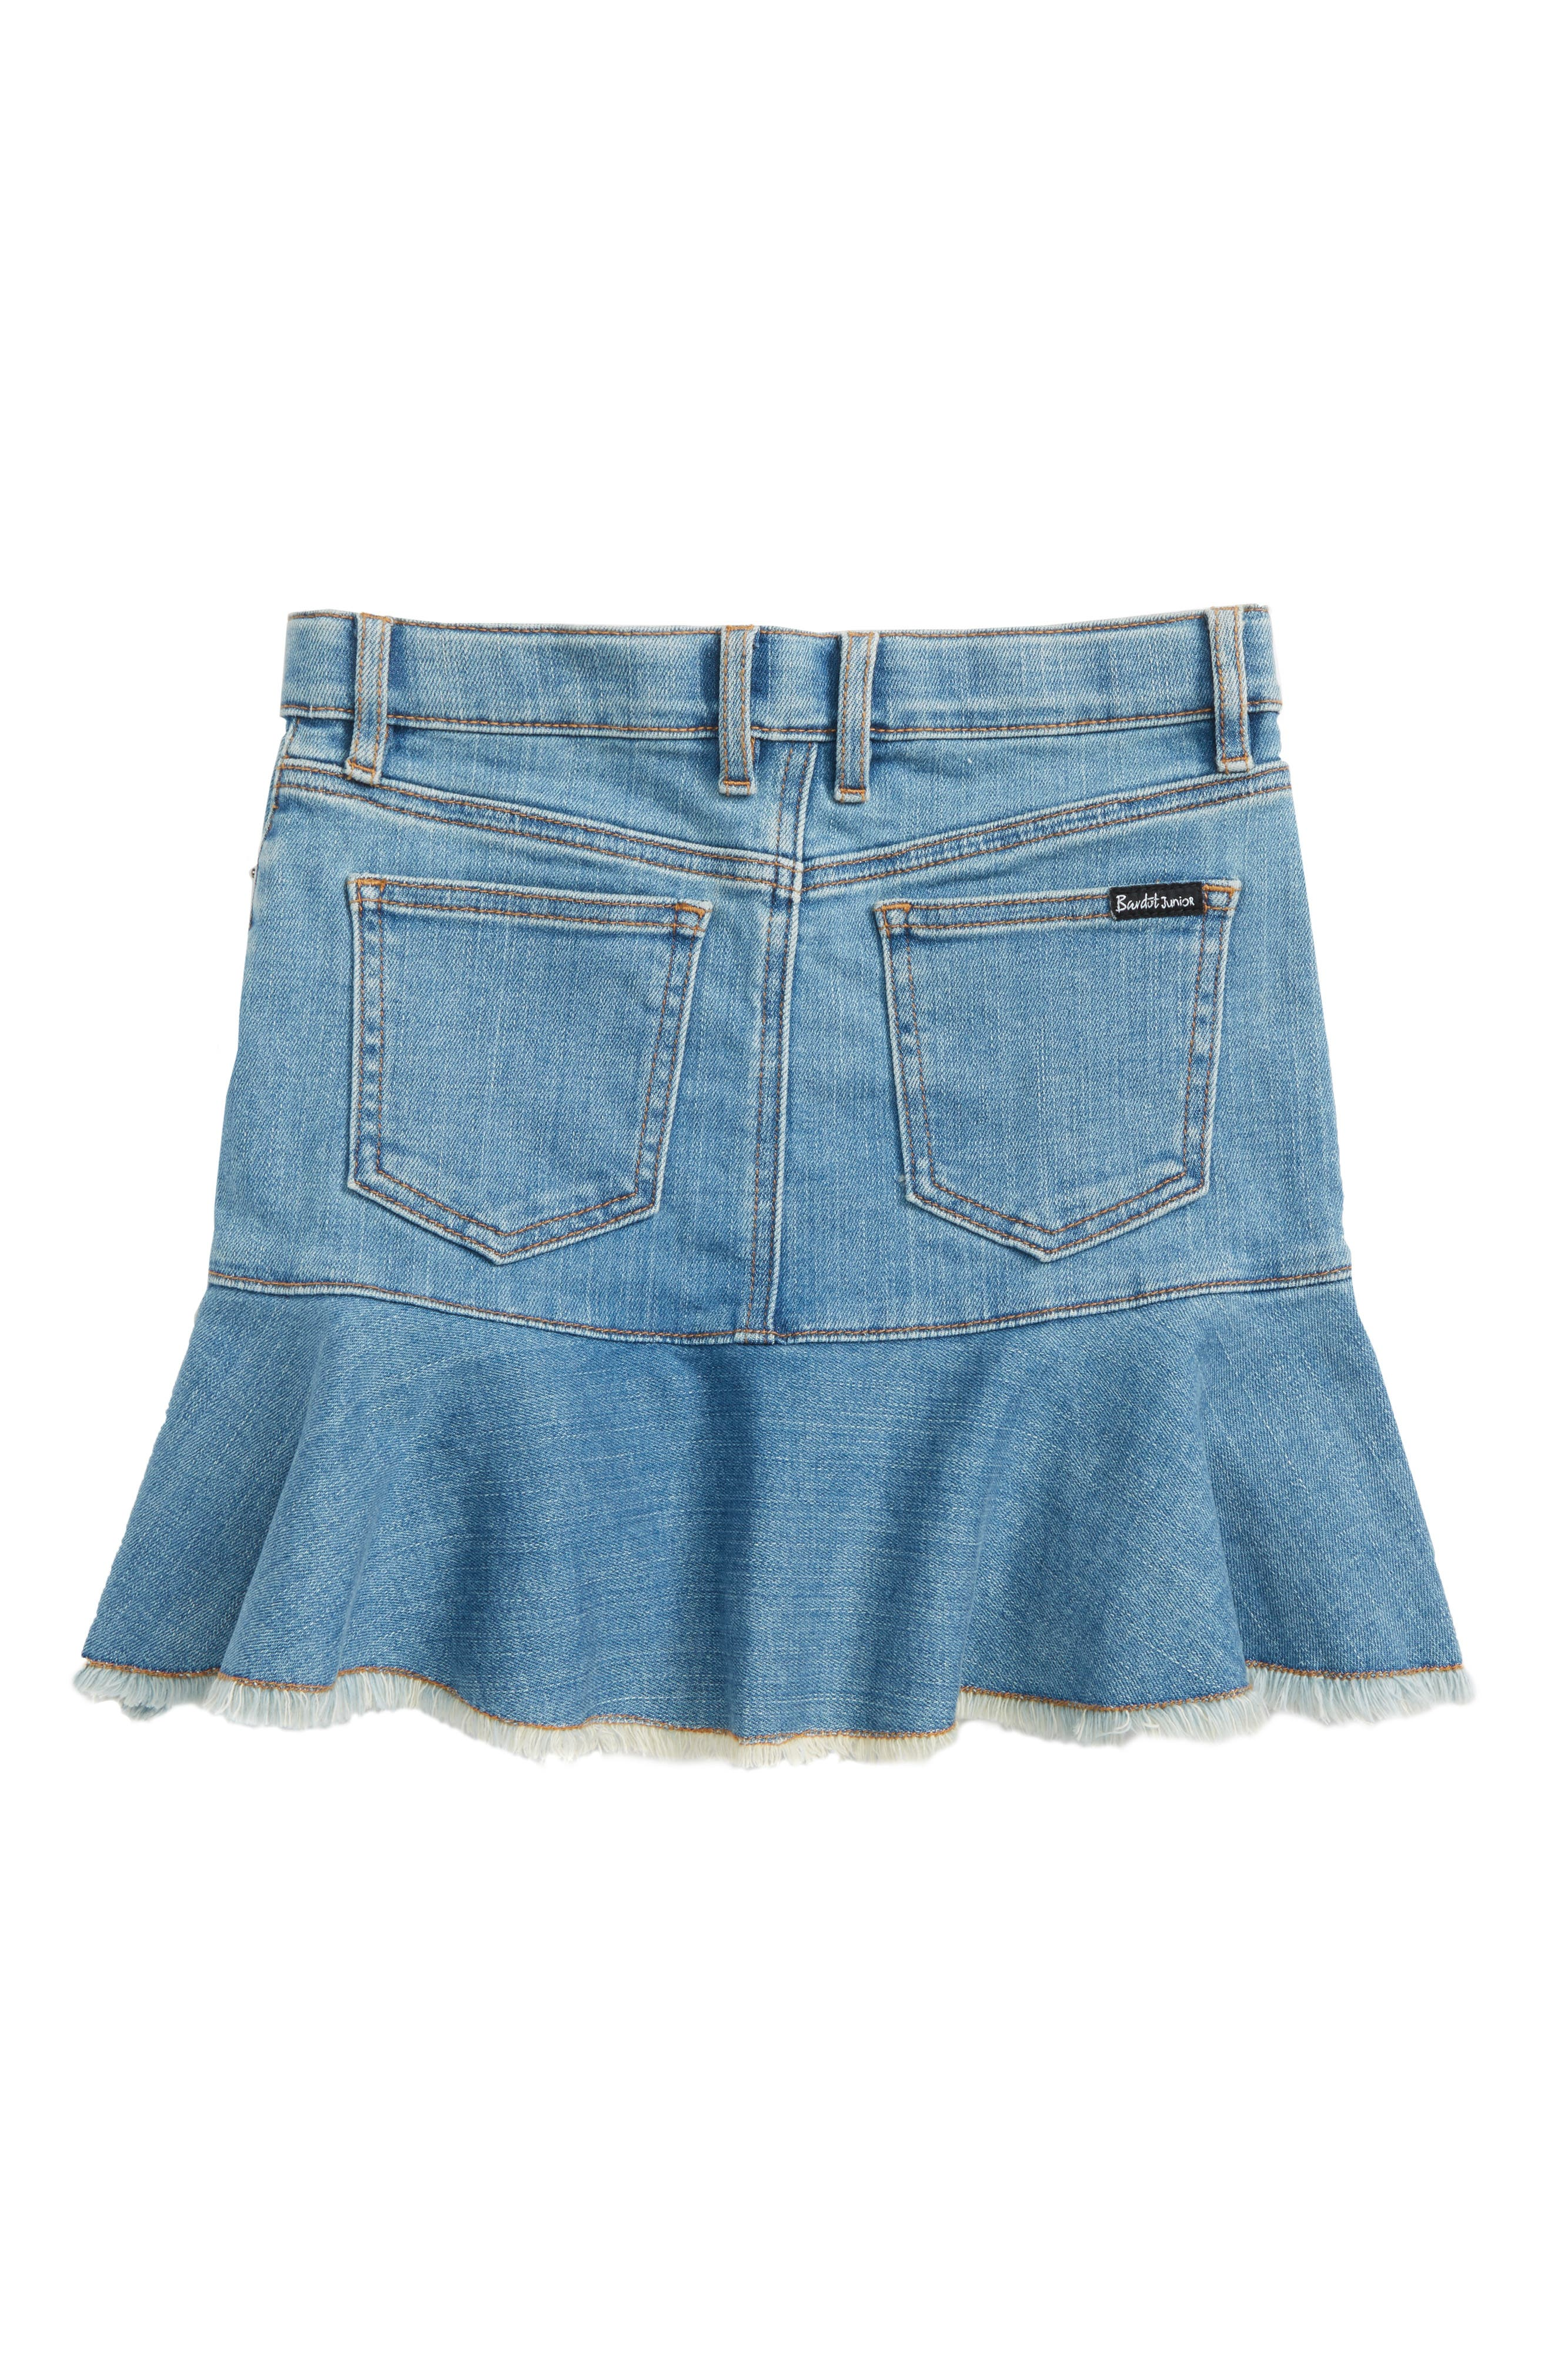 Mia Denim Skirt,                             Alternate thumbnail 2, color,                             Vintage Wash